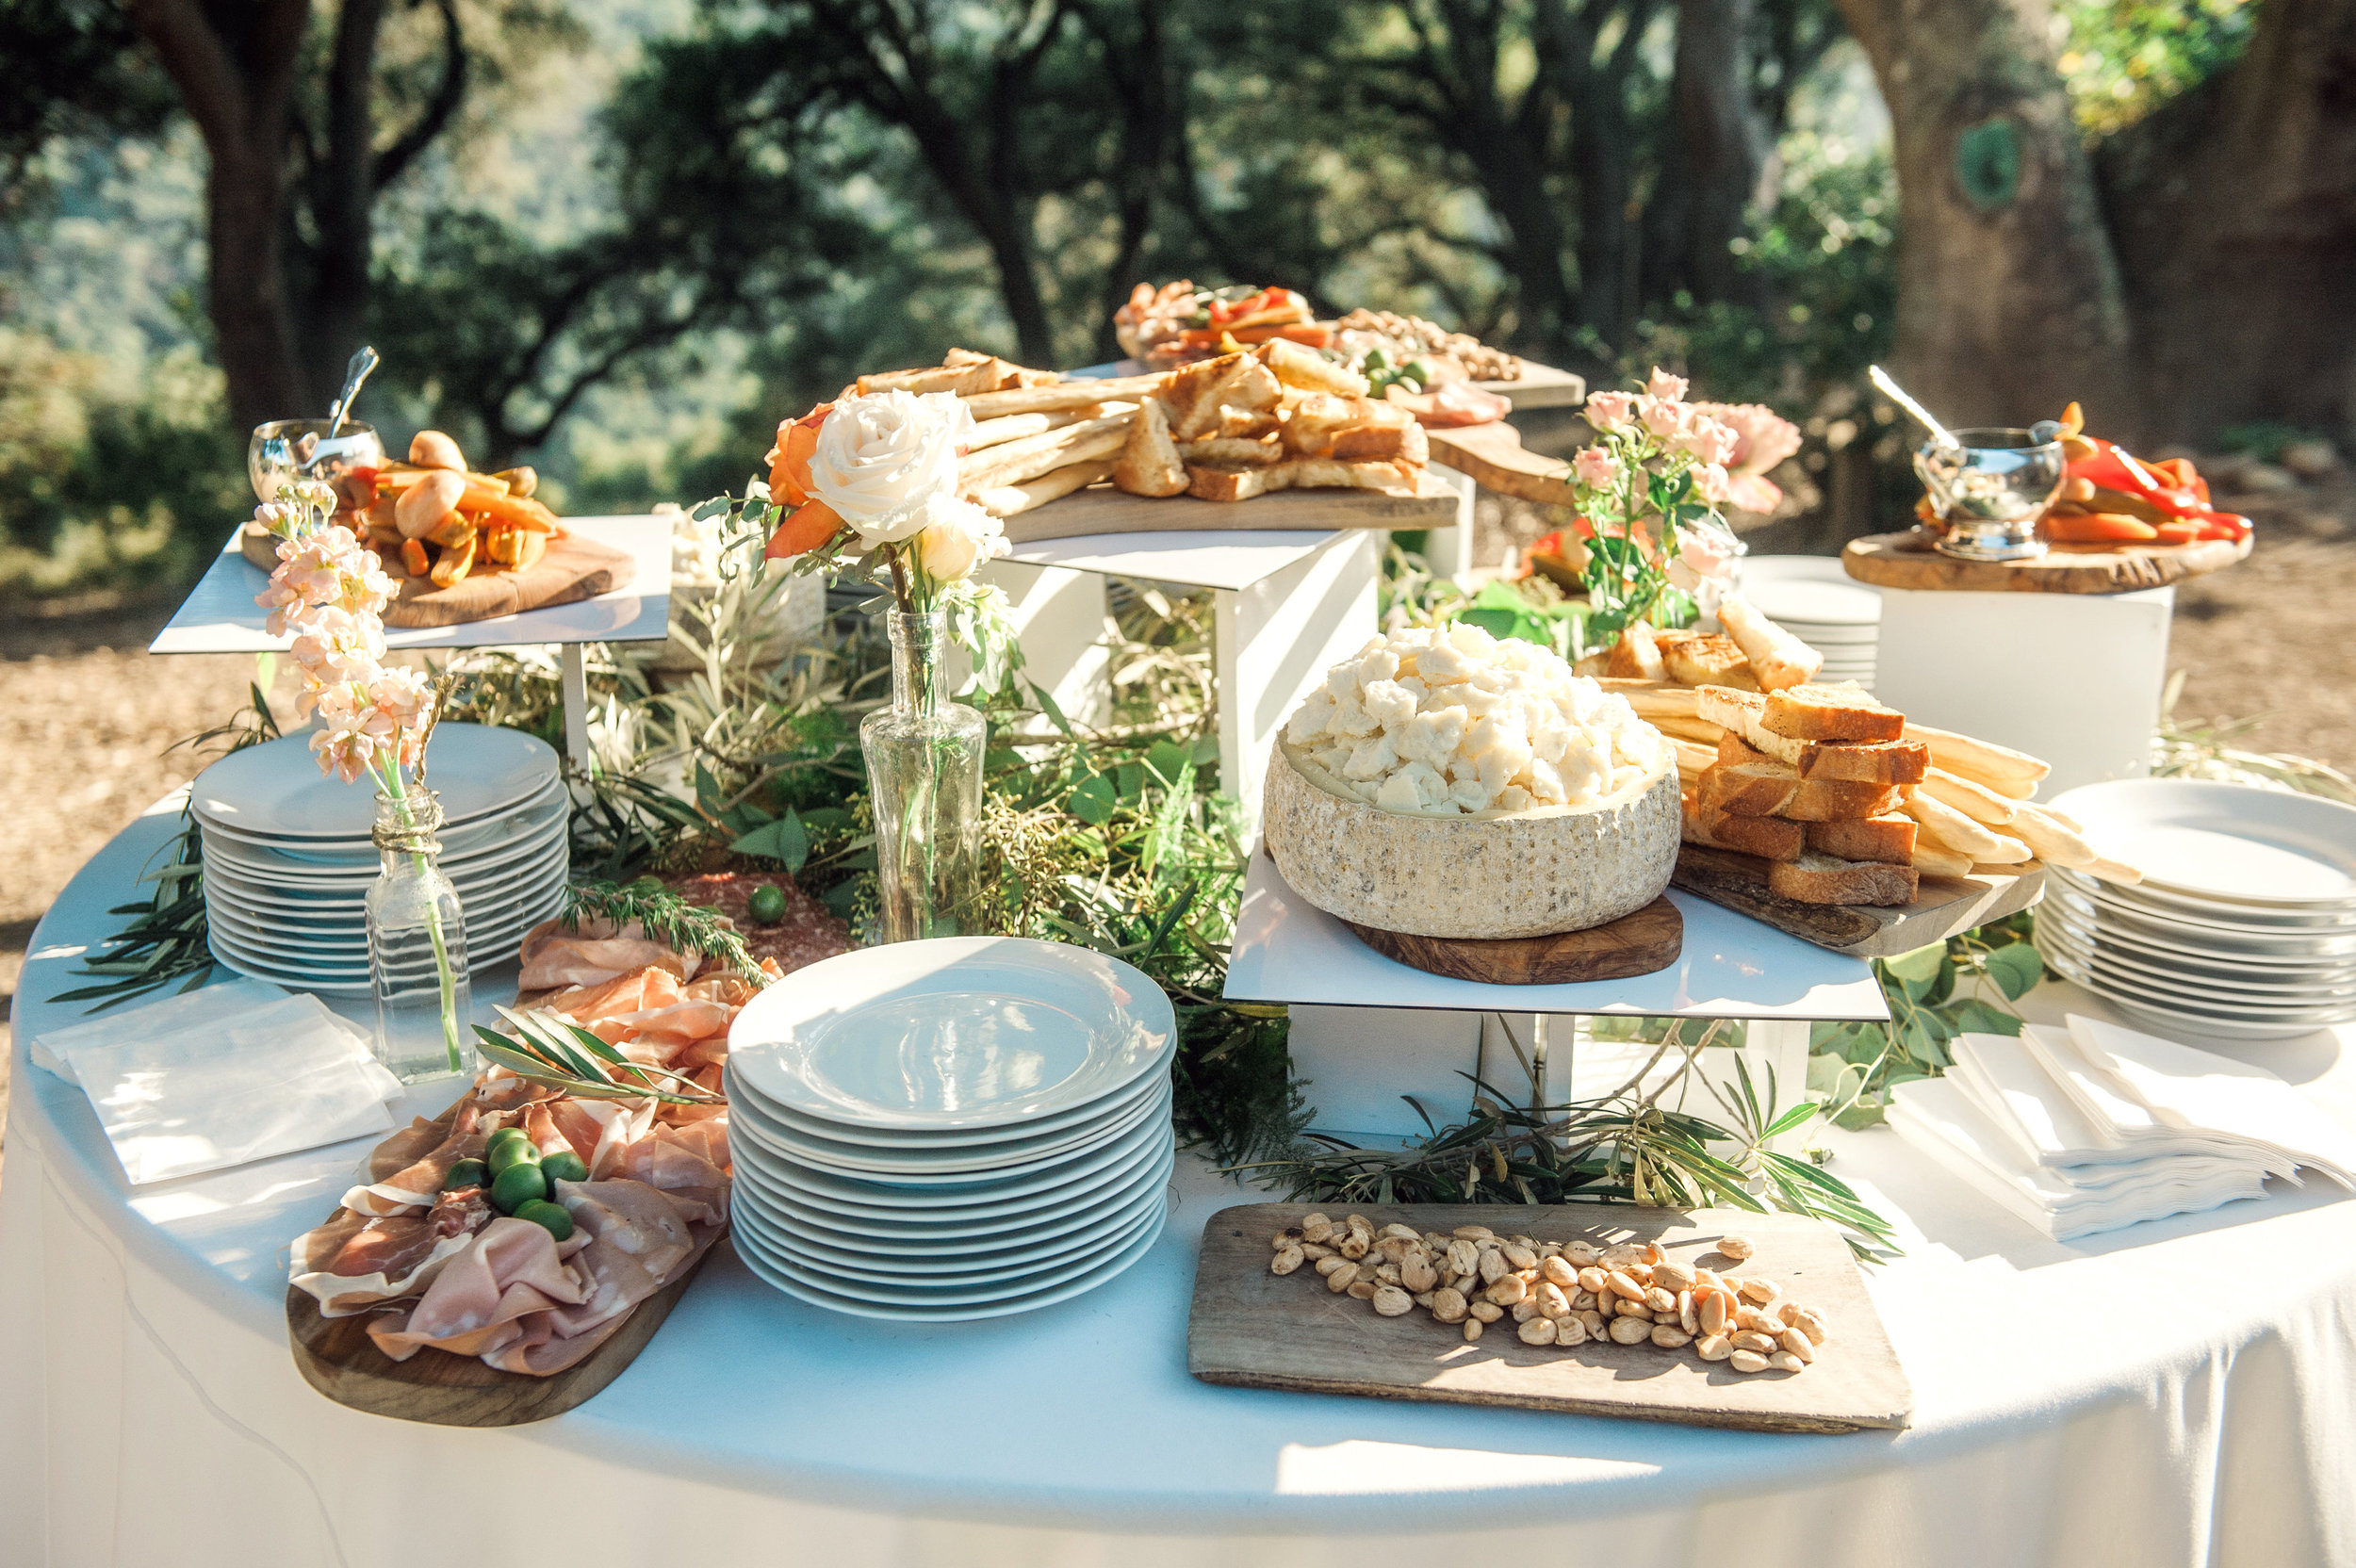 santabarbarawedding.com | Wisteria Lane Flroal Design Studio | Bride and Groom | Garden Roses | Tea Roses | Spray Roses | Food Station Decor